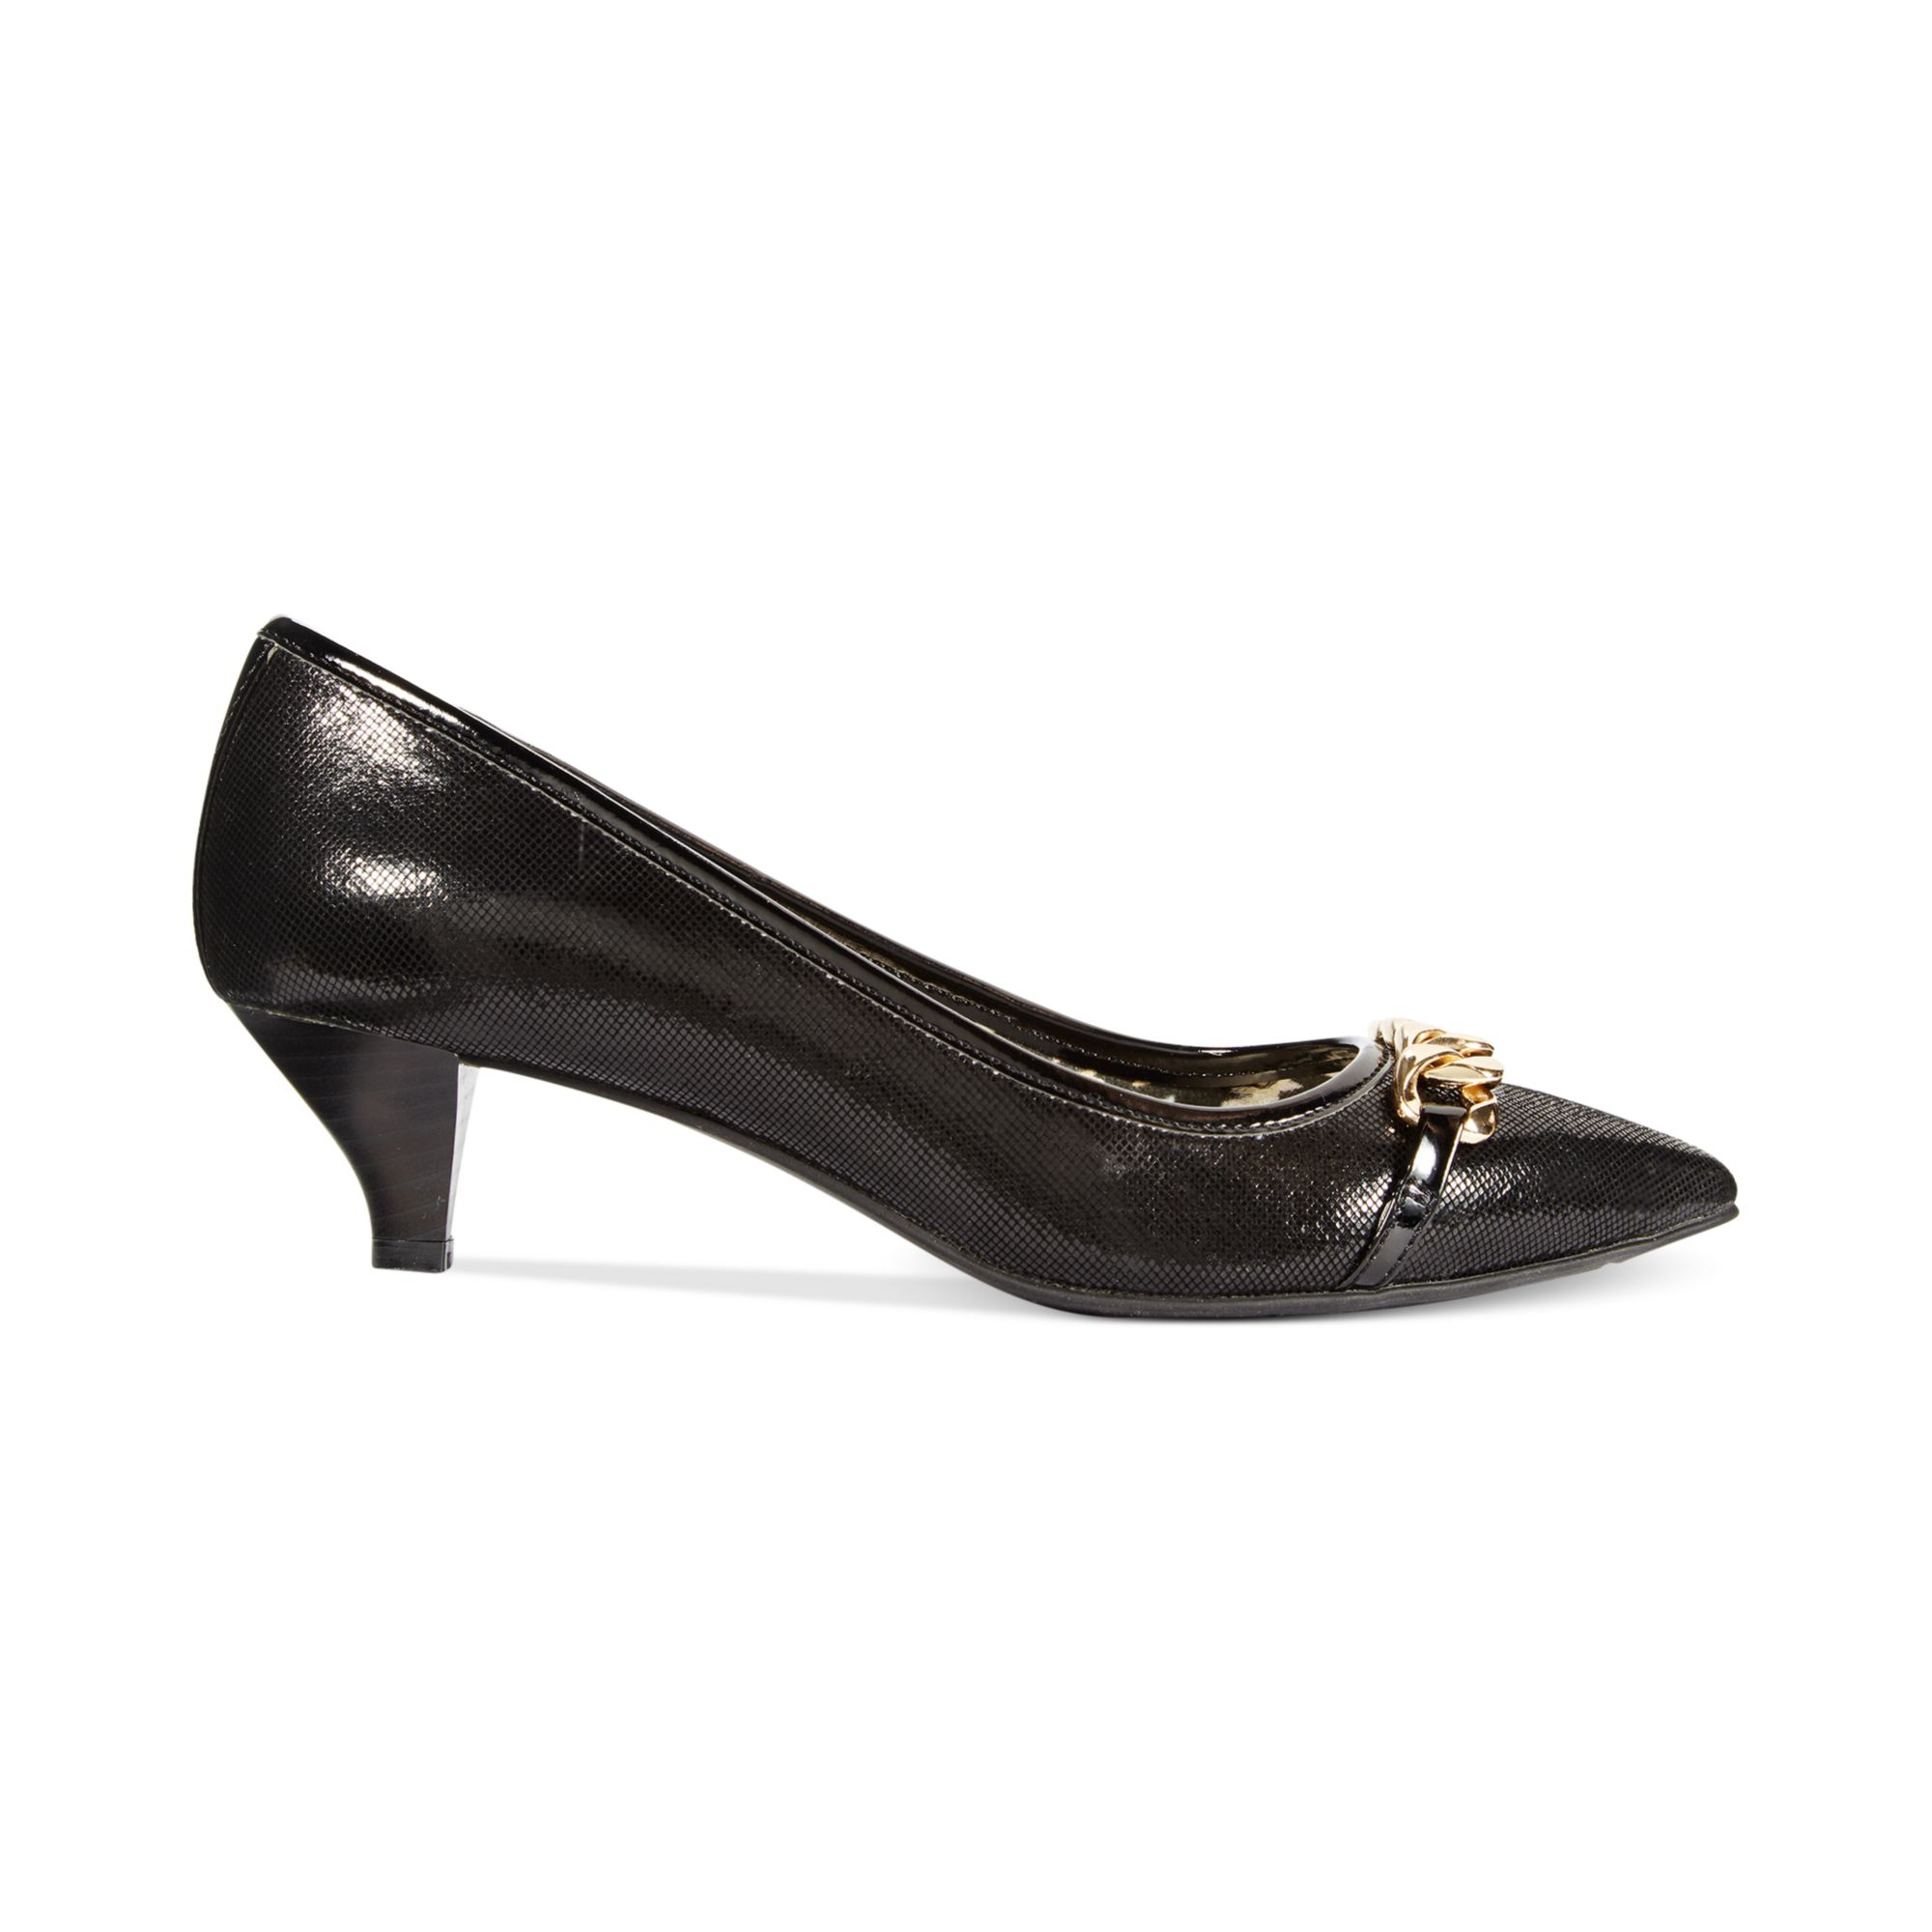 Macys Shoes Womens Heels